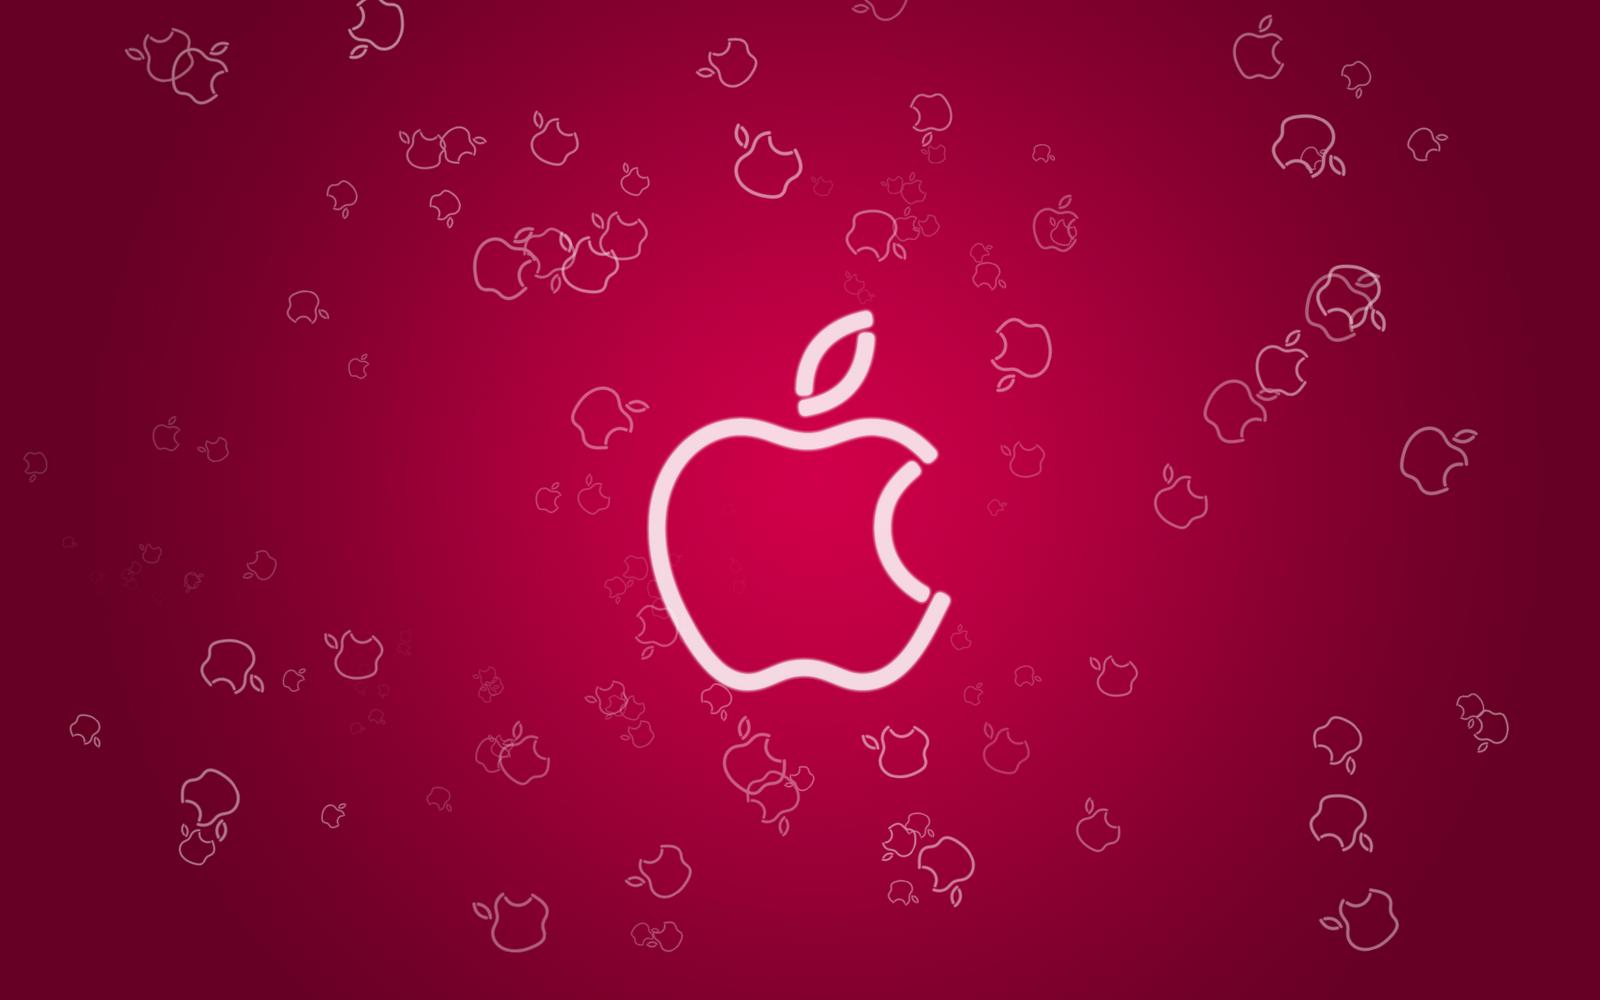 Apple Logo Wallpapers - Apple Wallpaper